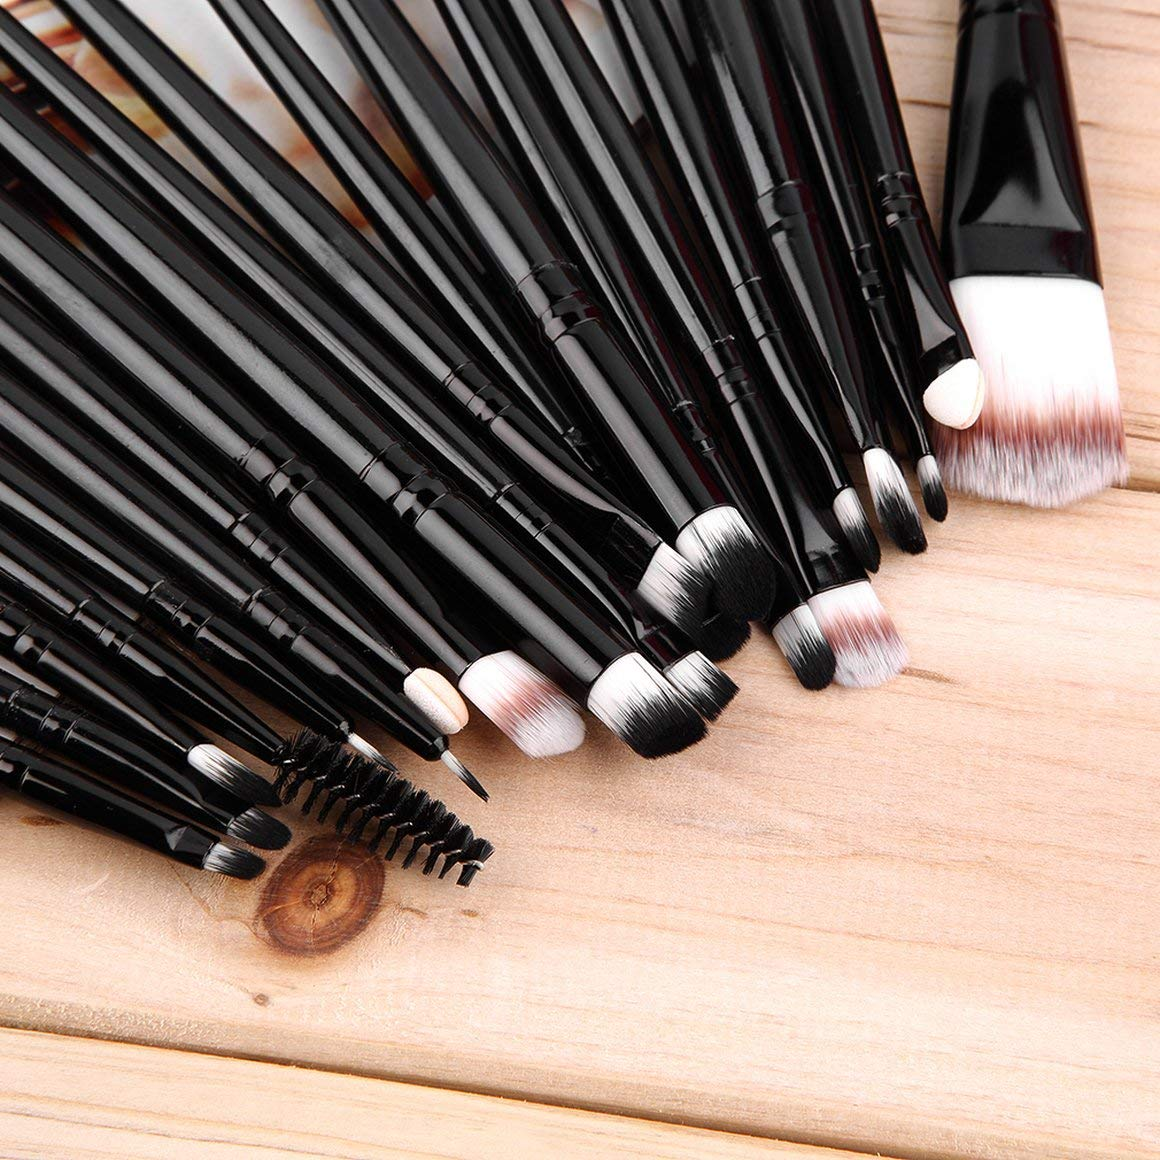 Powder Make up Brush Env/ío gratis Funnyrunstore New 20 pcs Maquillaje profesional Belleza Cosm/ética Blush Black Brushes Kits Foundation